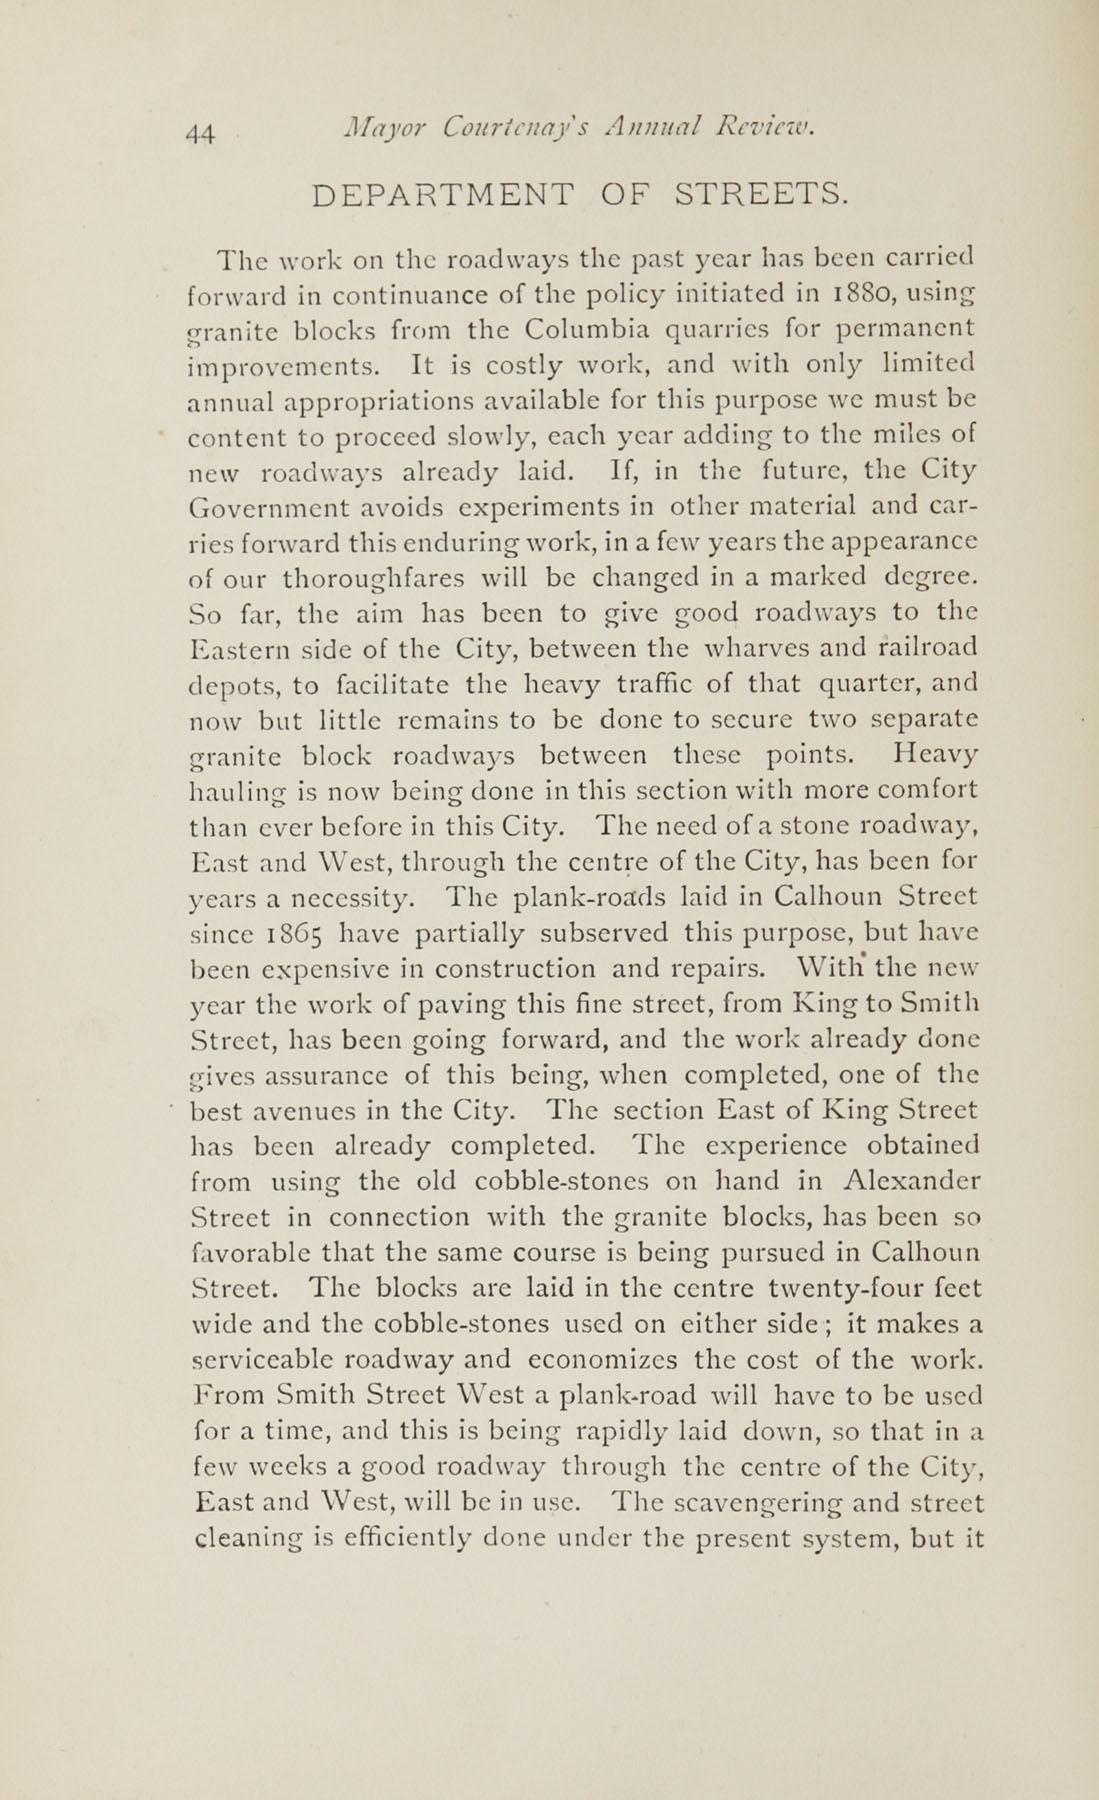 Charleston Yearbook, 1882, page 44